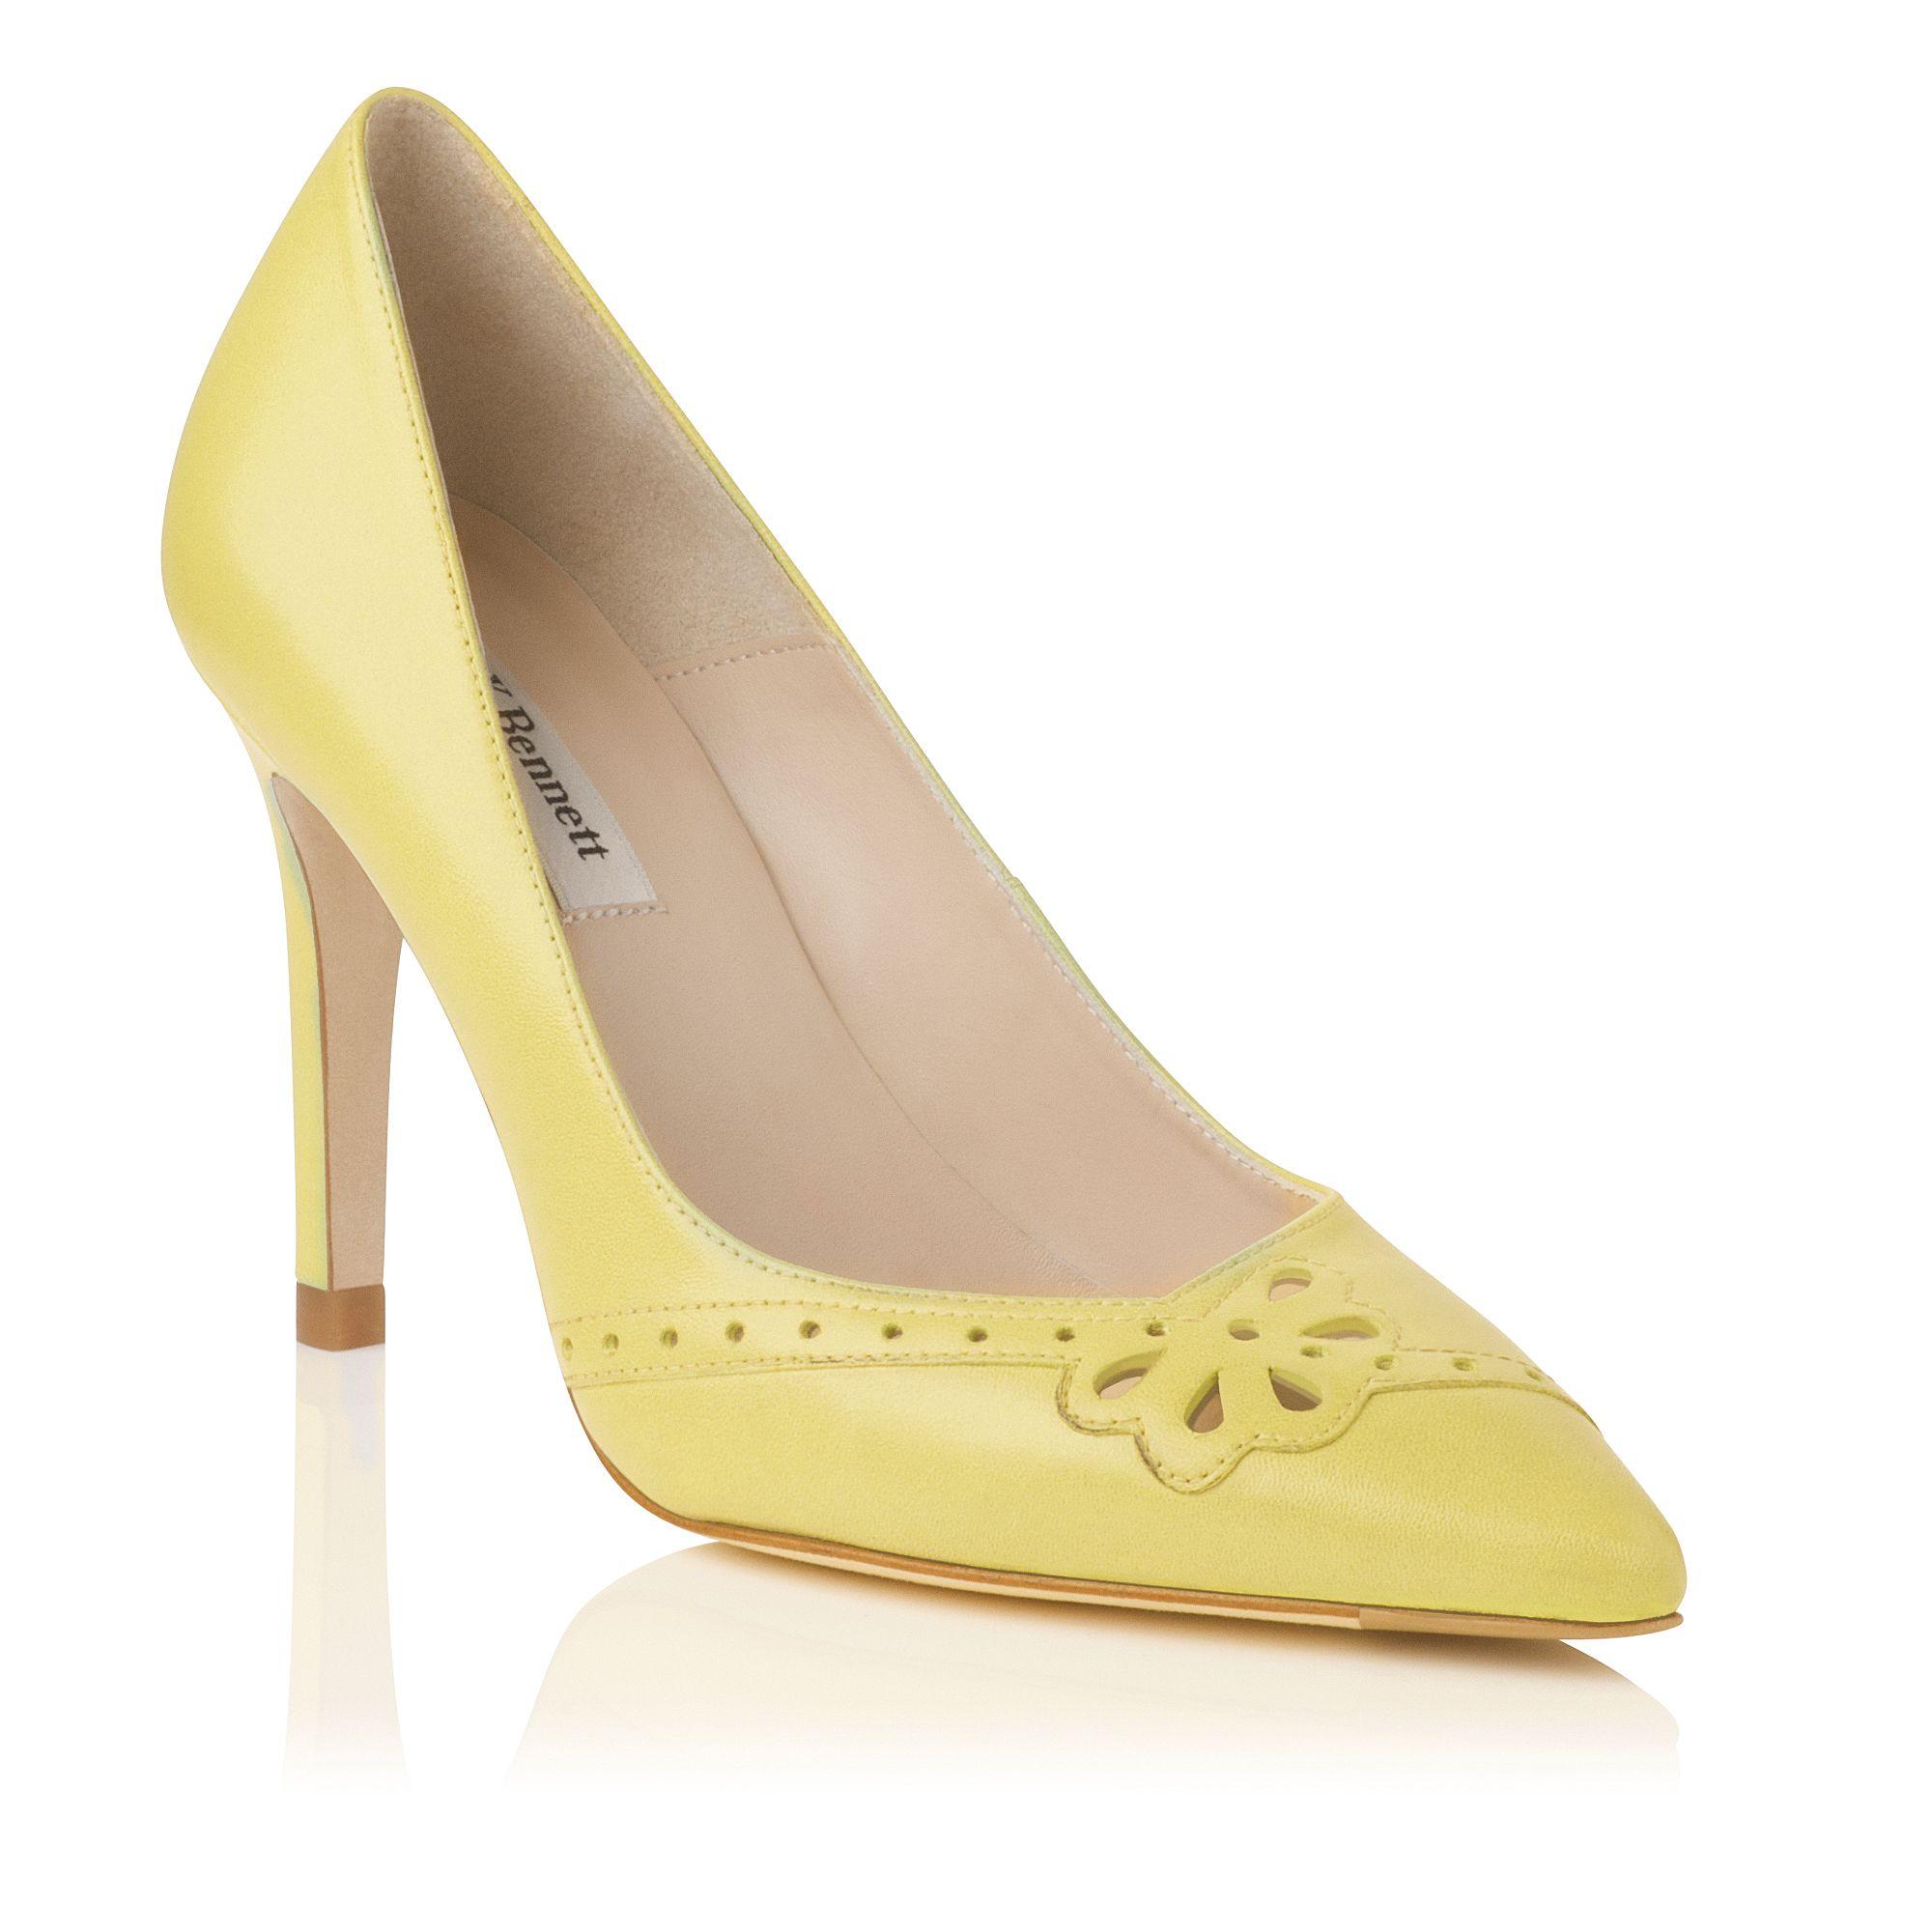 Lemon Yellow Court Shoes